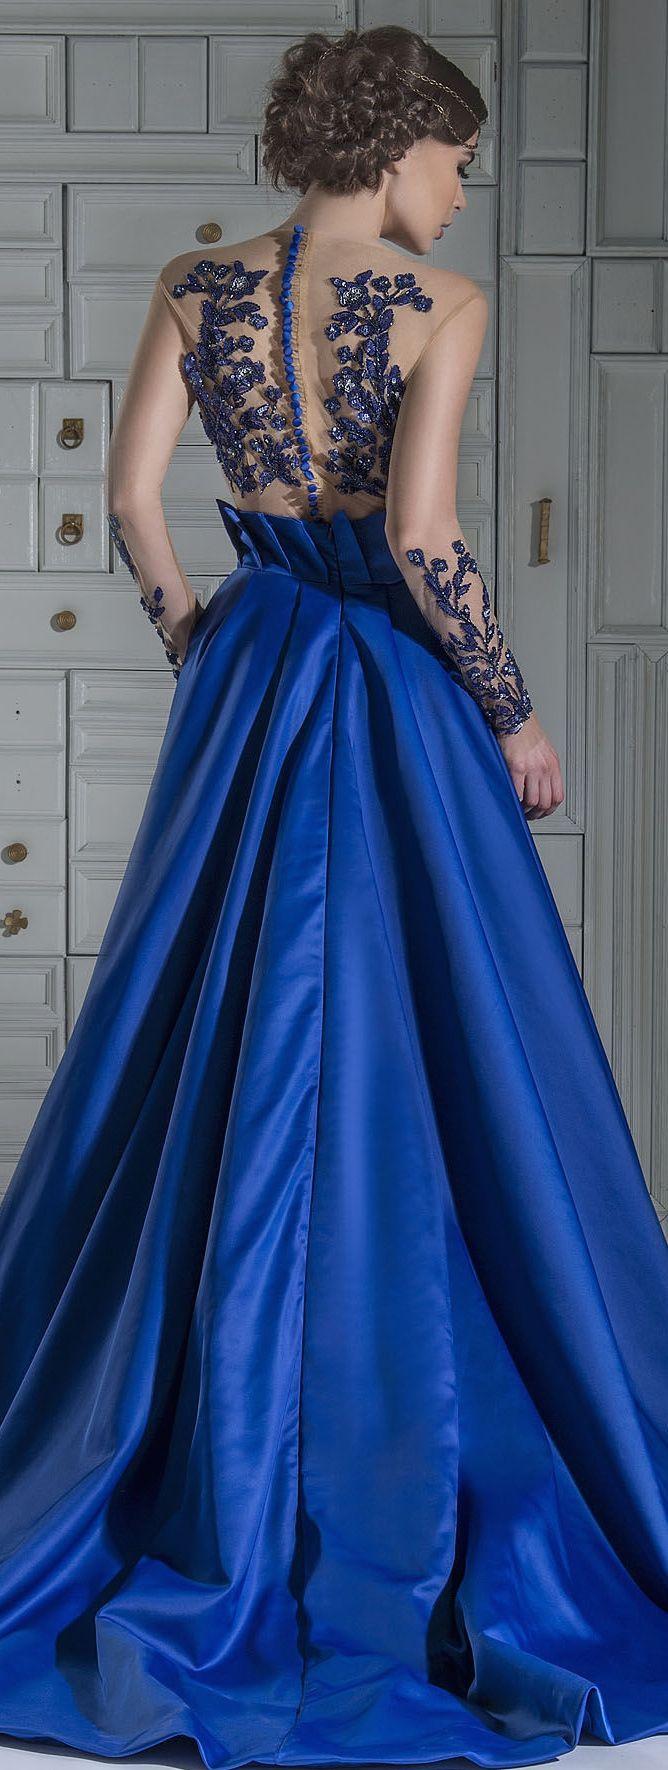 Chrystelle atallah royal blue pinterest gowns royal blue